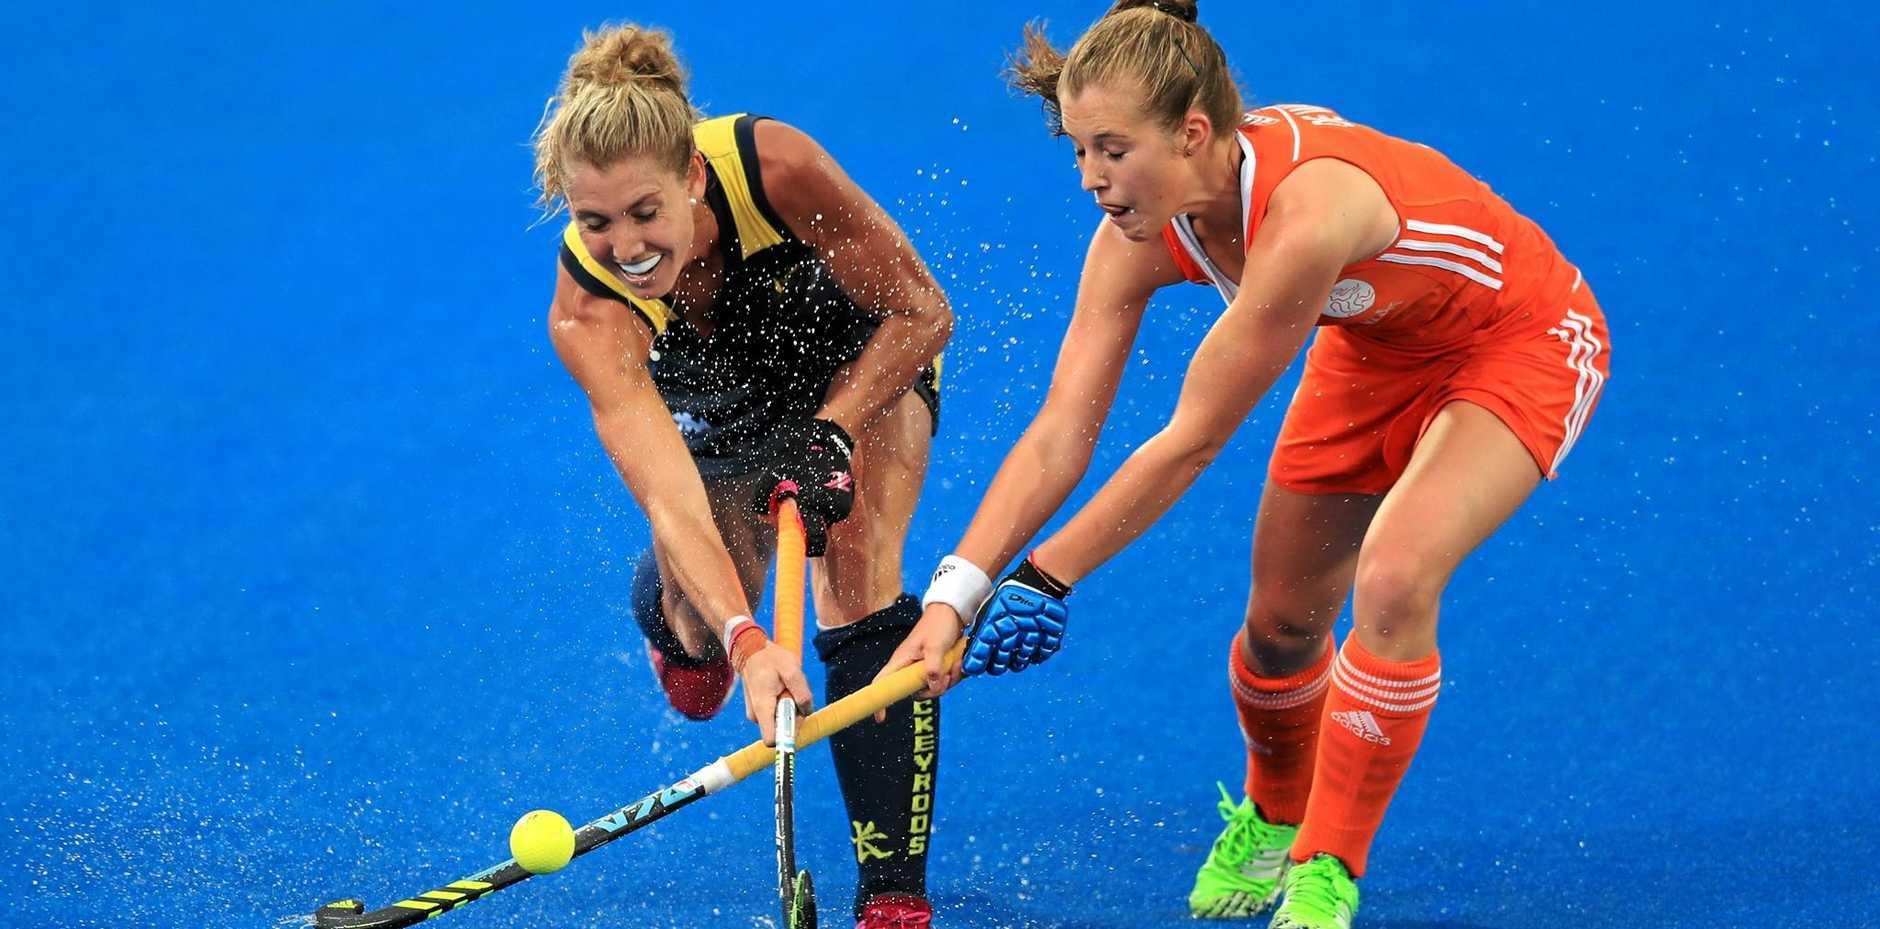 UNDER PRESSURE: Australia's Casey Sablowski (left) and Netherland's Margot van Geffen chase the ball during their Champions Trophy clash in London.